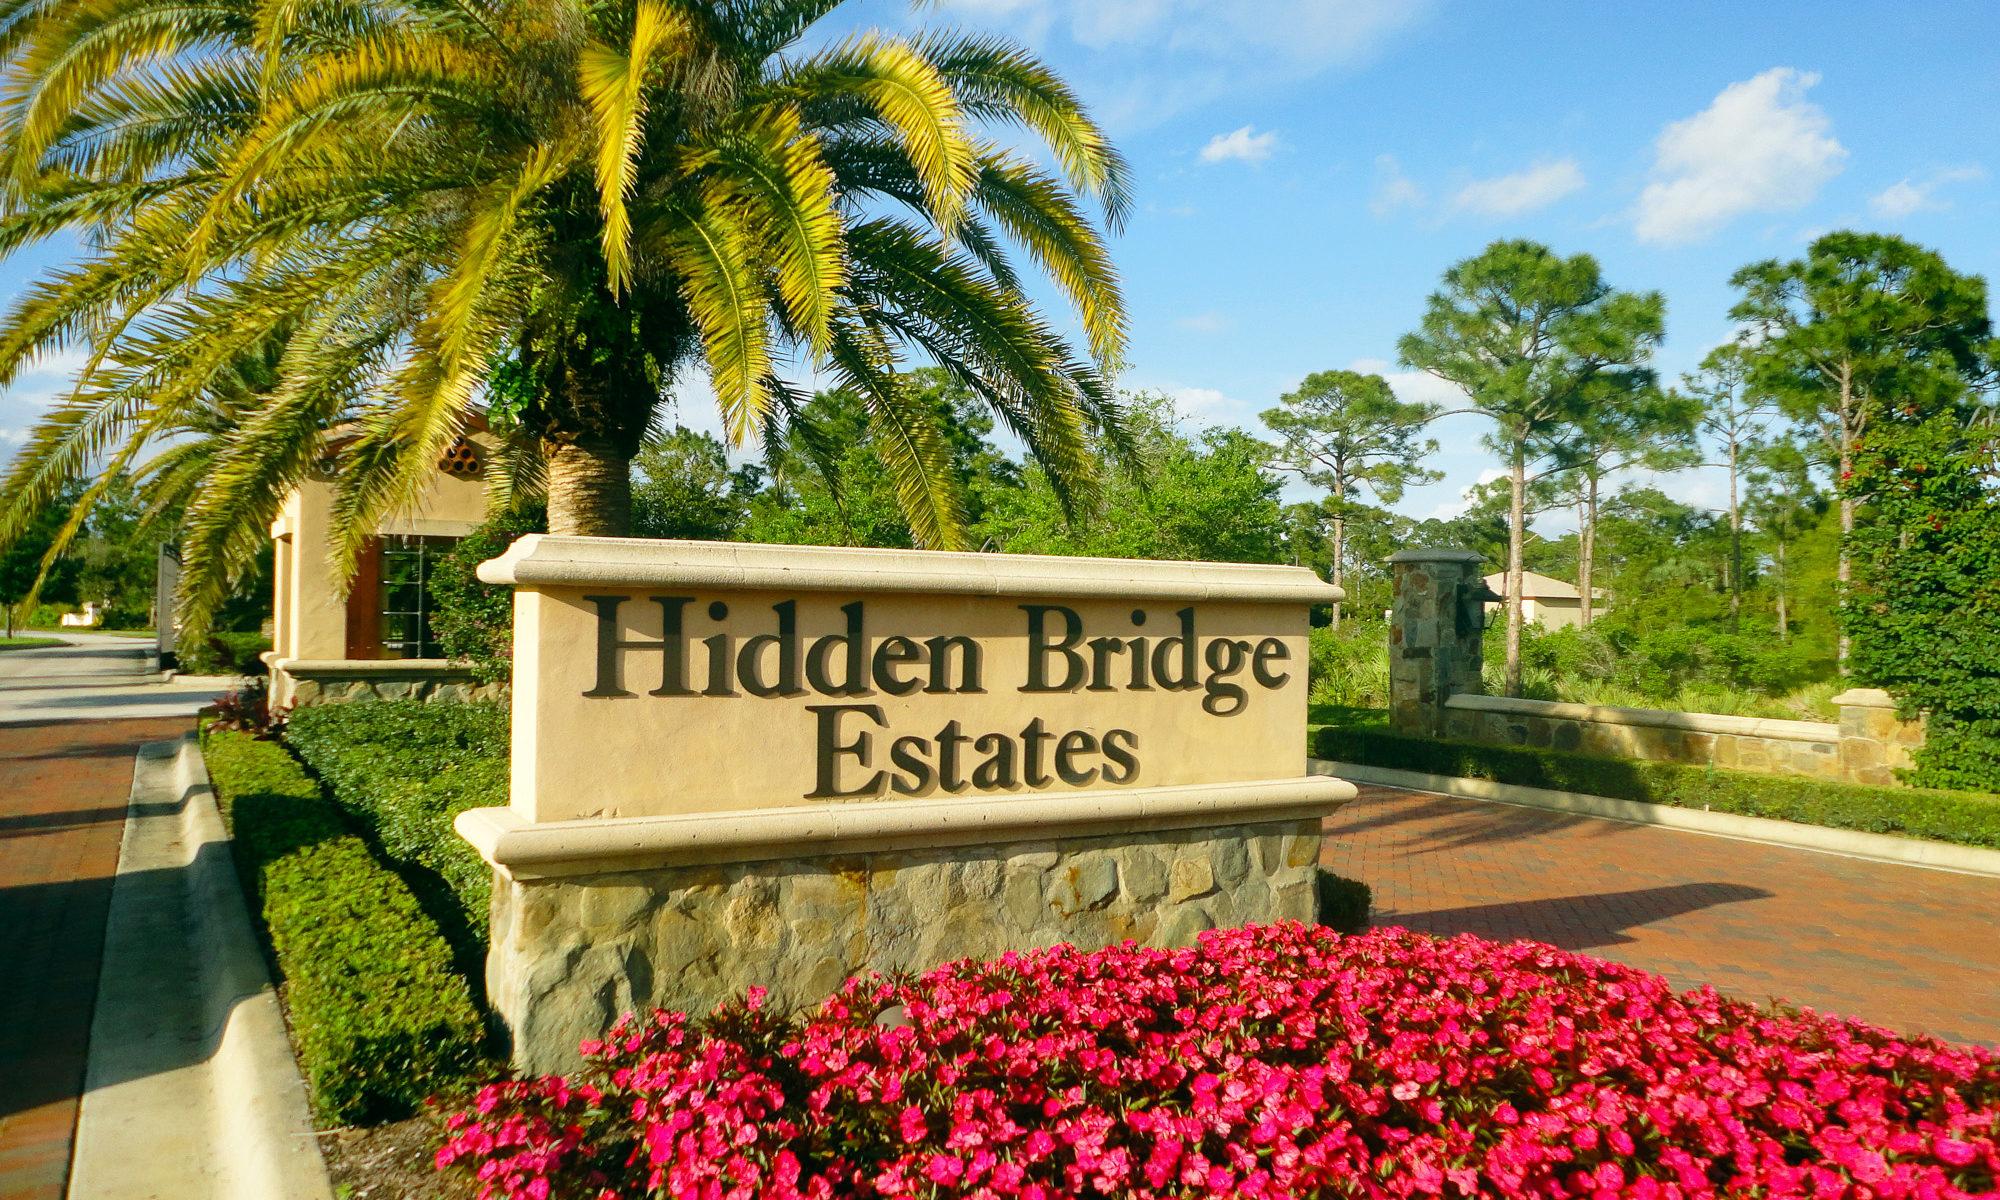 01_sign_Hidden-Bridge-Estates